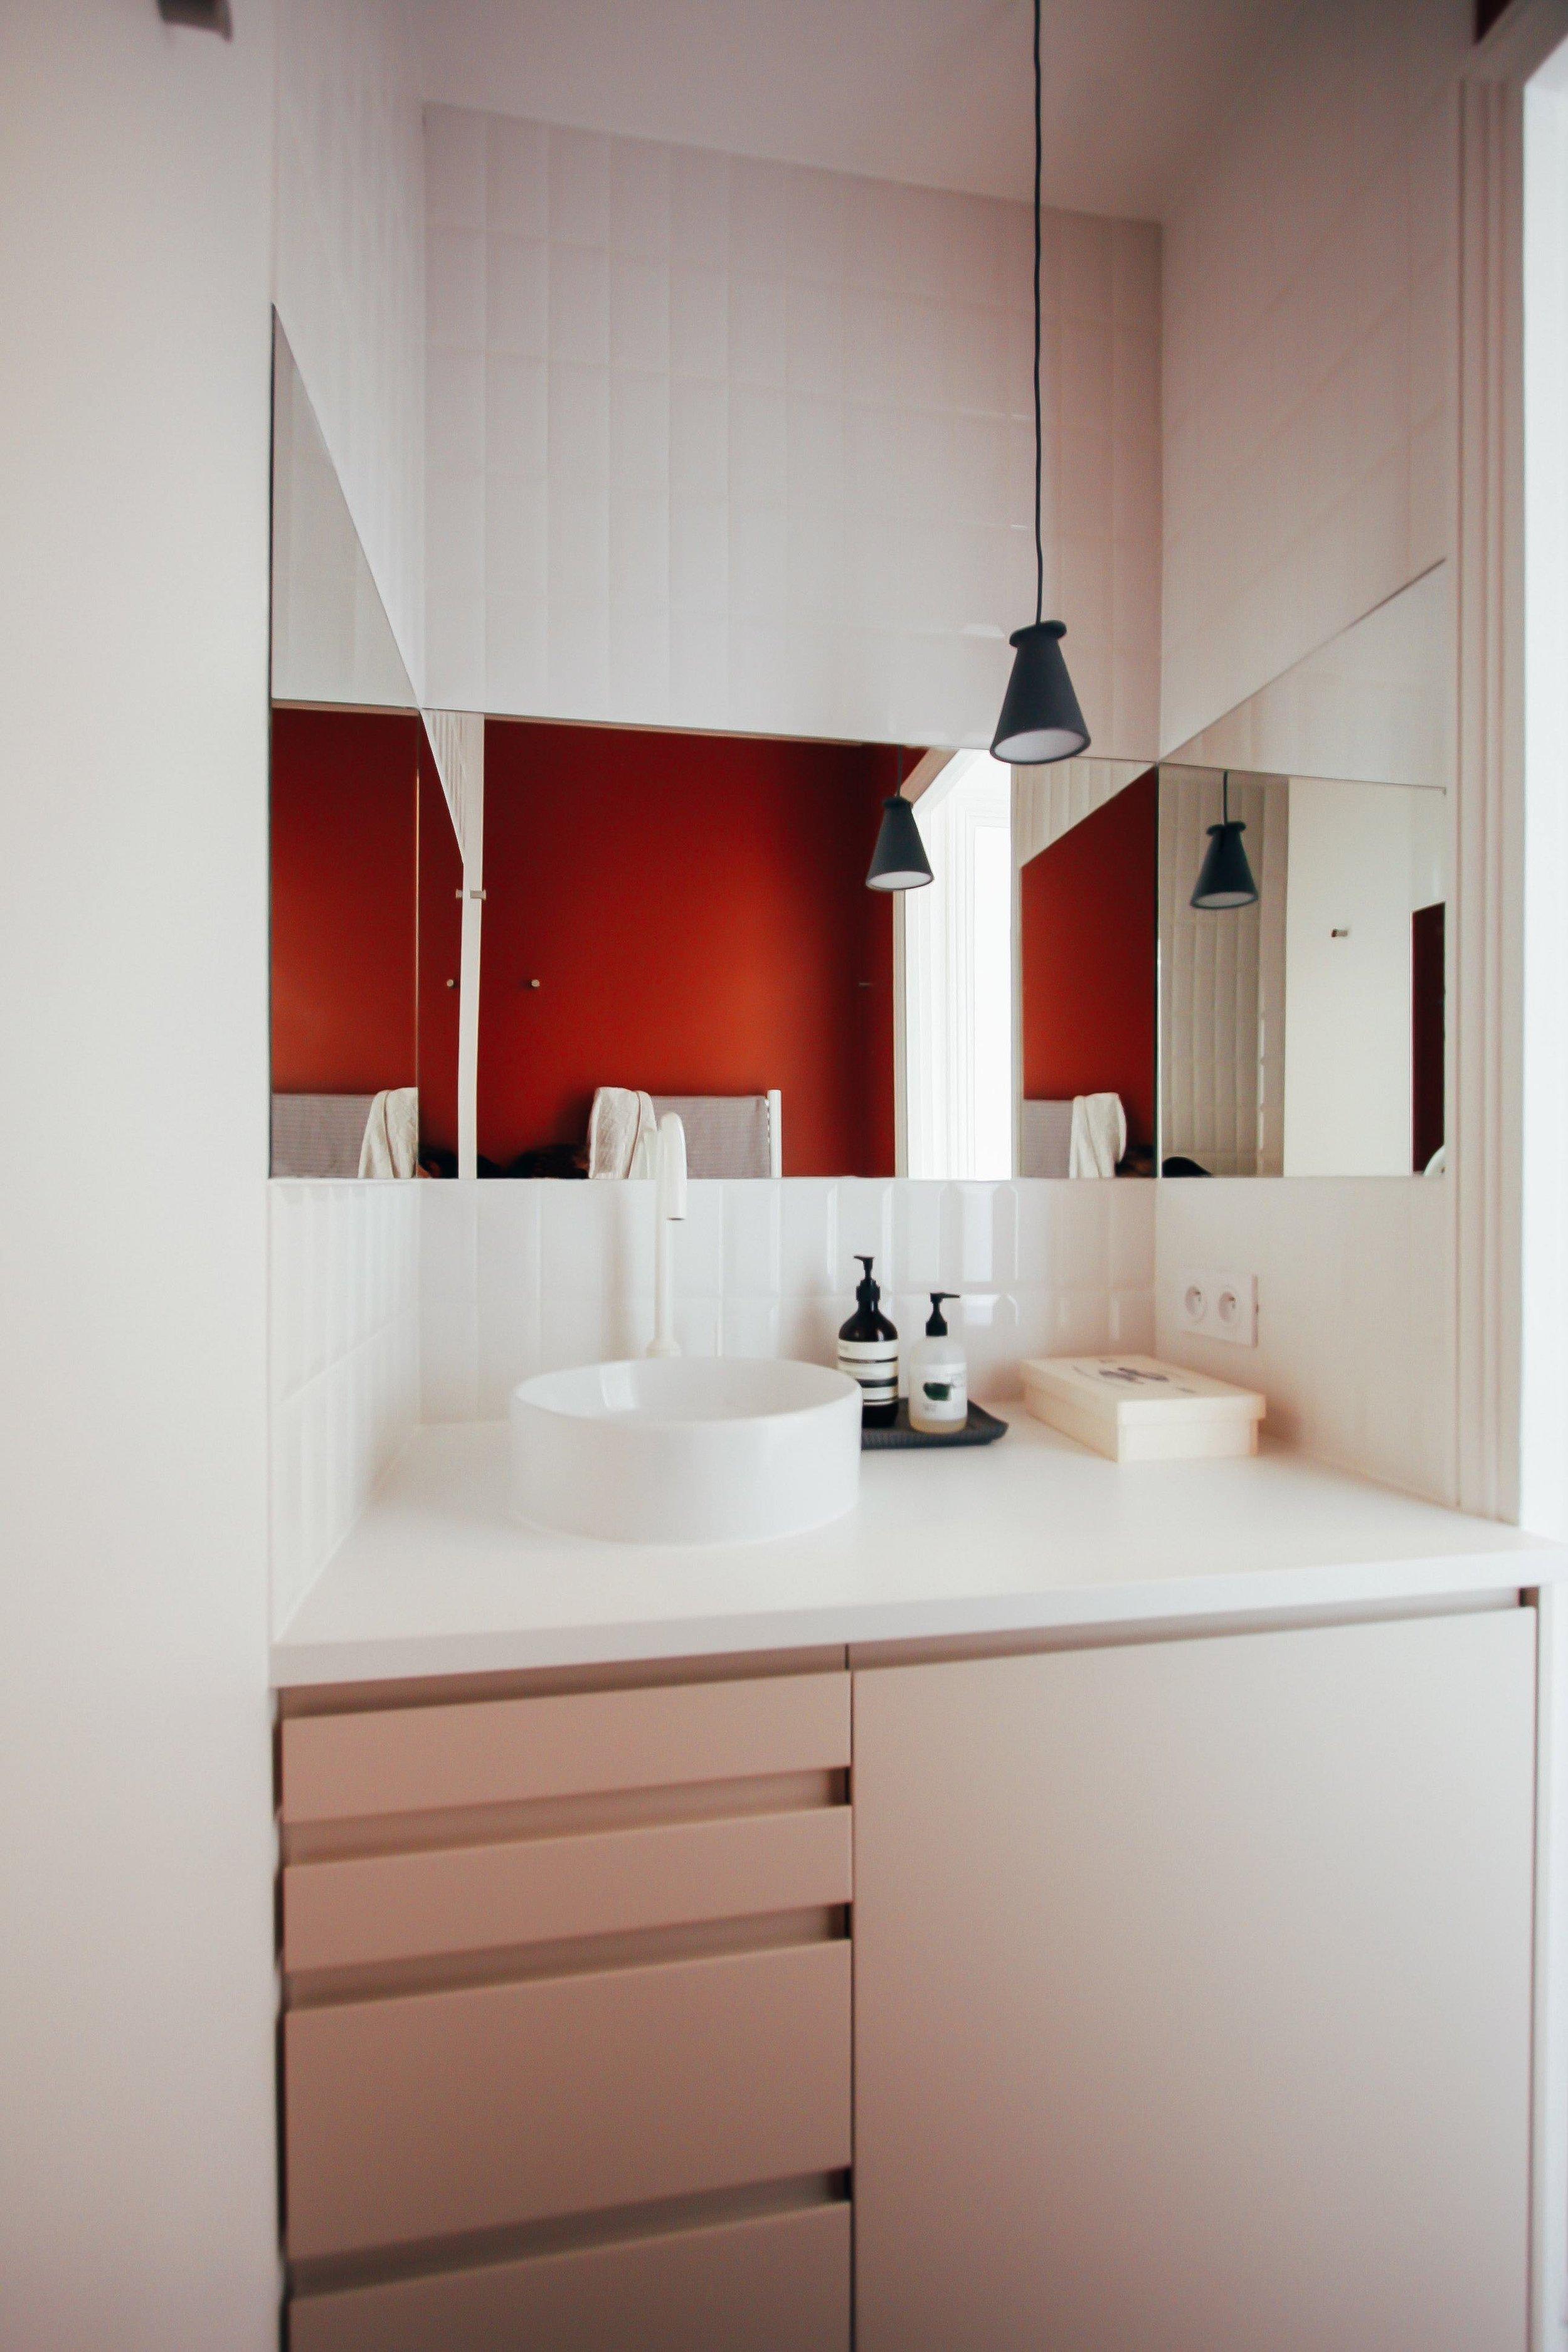 architecte-interieur-paris-terregrise-balard-12.jpg